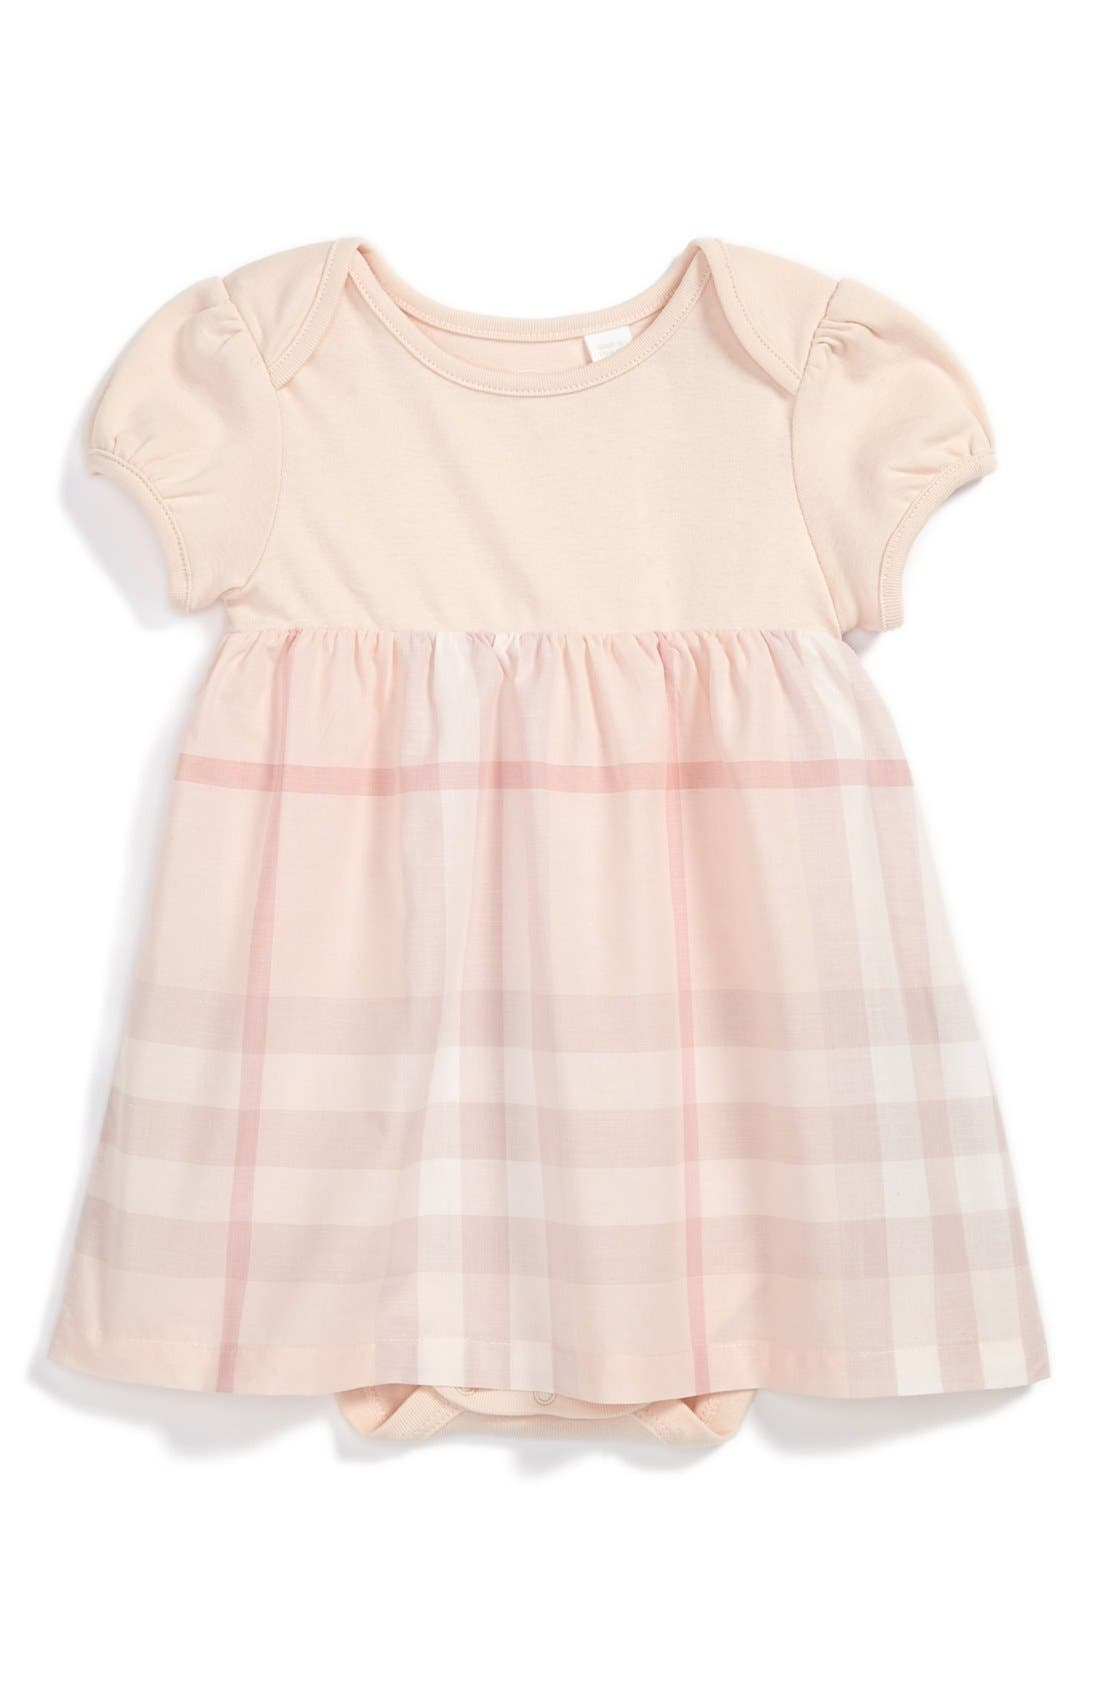 Main Image - Burberry 'Cherrylina' Knit & Woven Dress (Baby Girls)